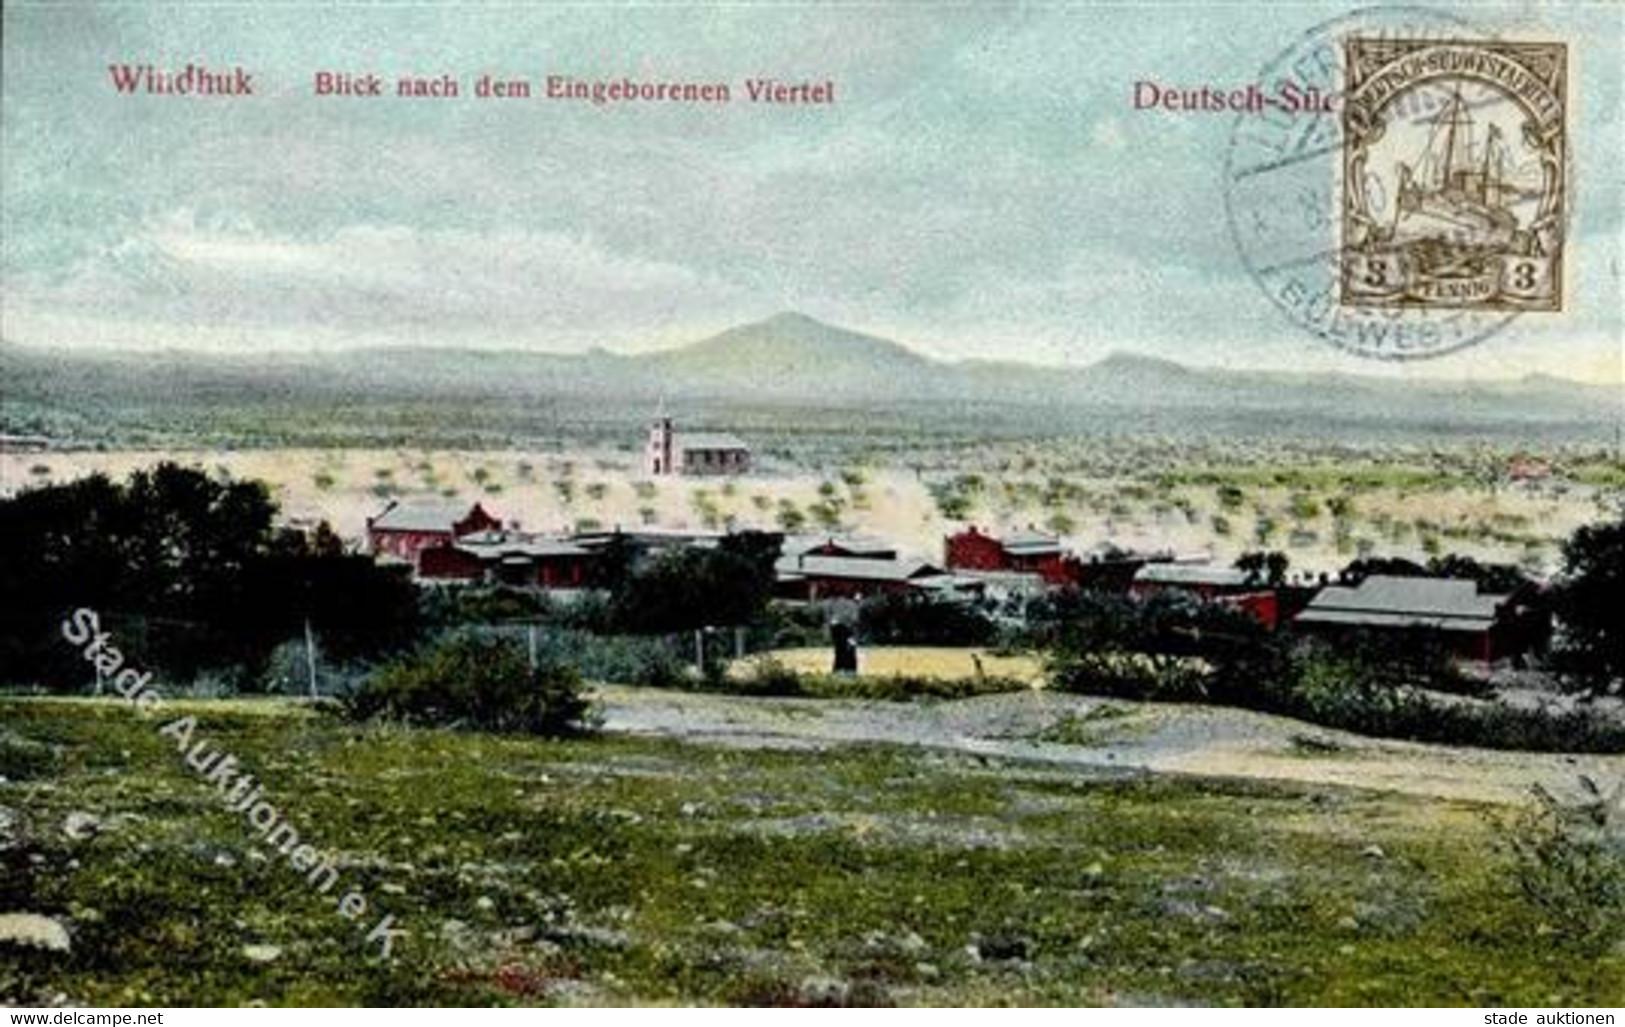 Kolonien Deutsch Südwestafrika Windhuk Blick Nach Dem Eingeborenenviertel 1908 I-II Colonies - Afrika